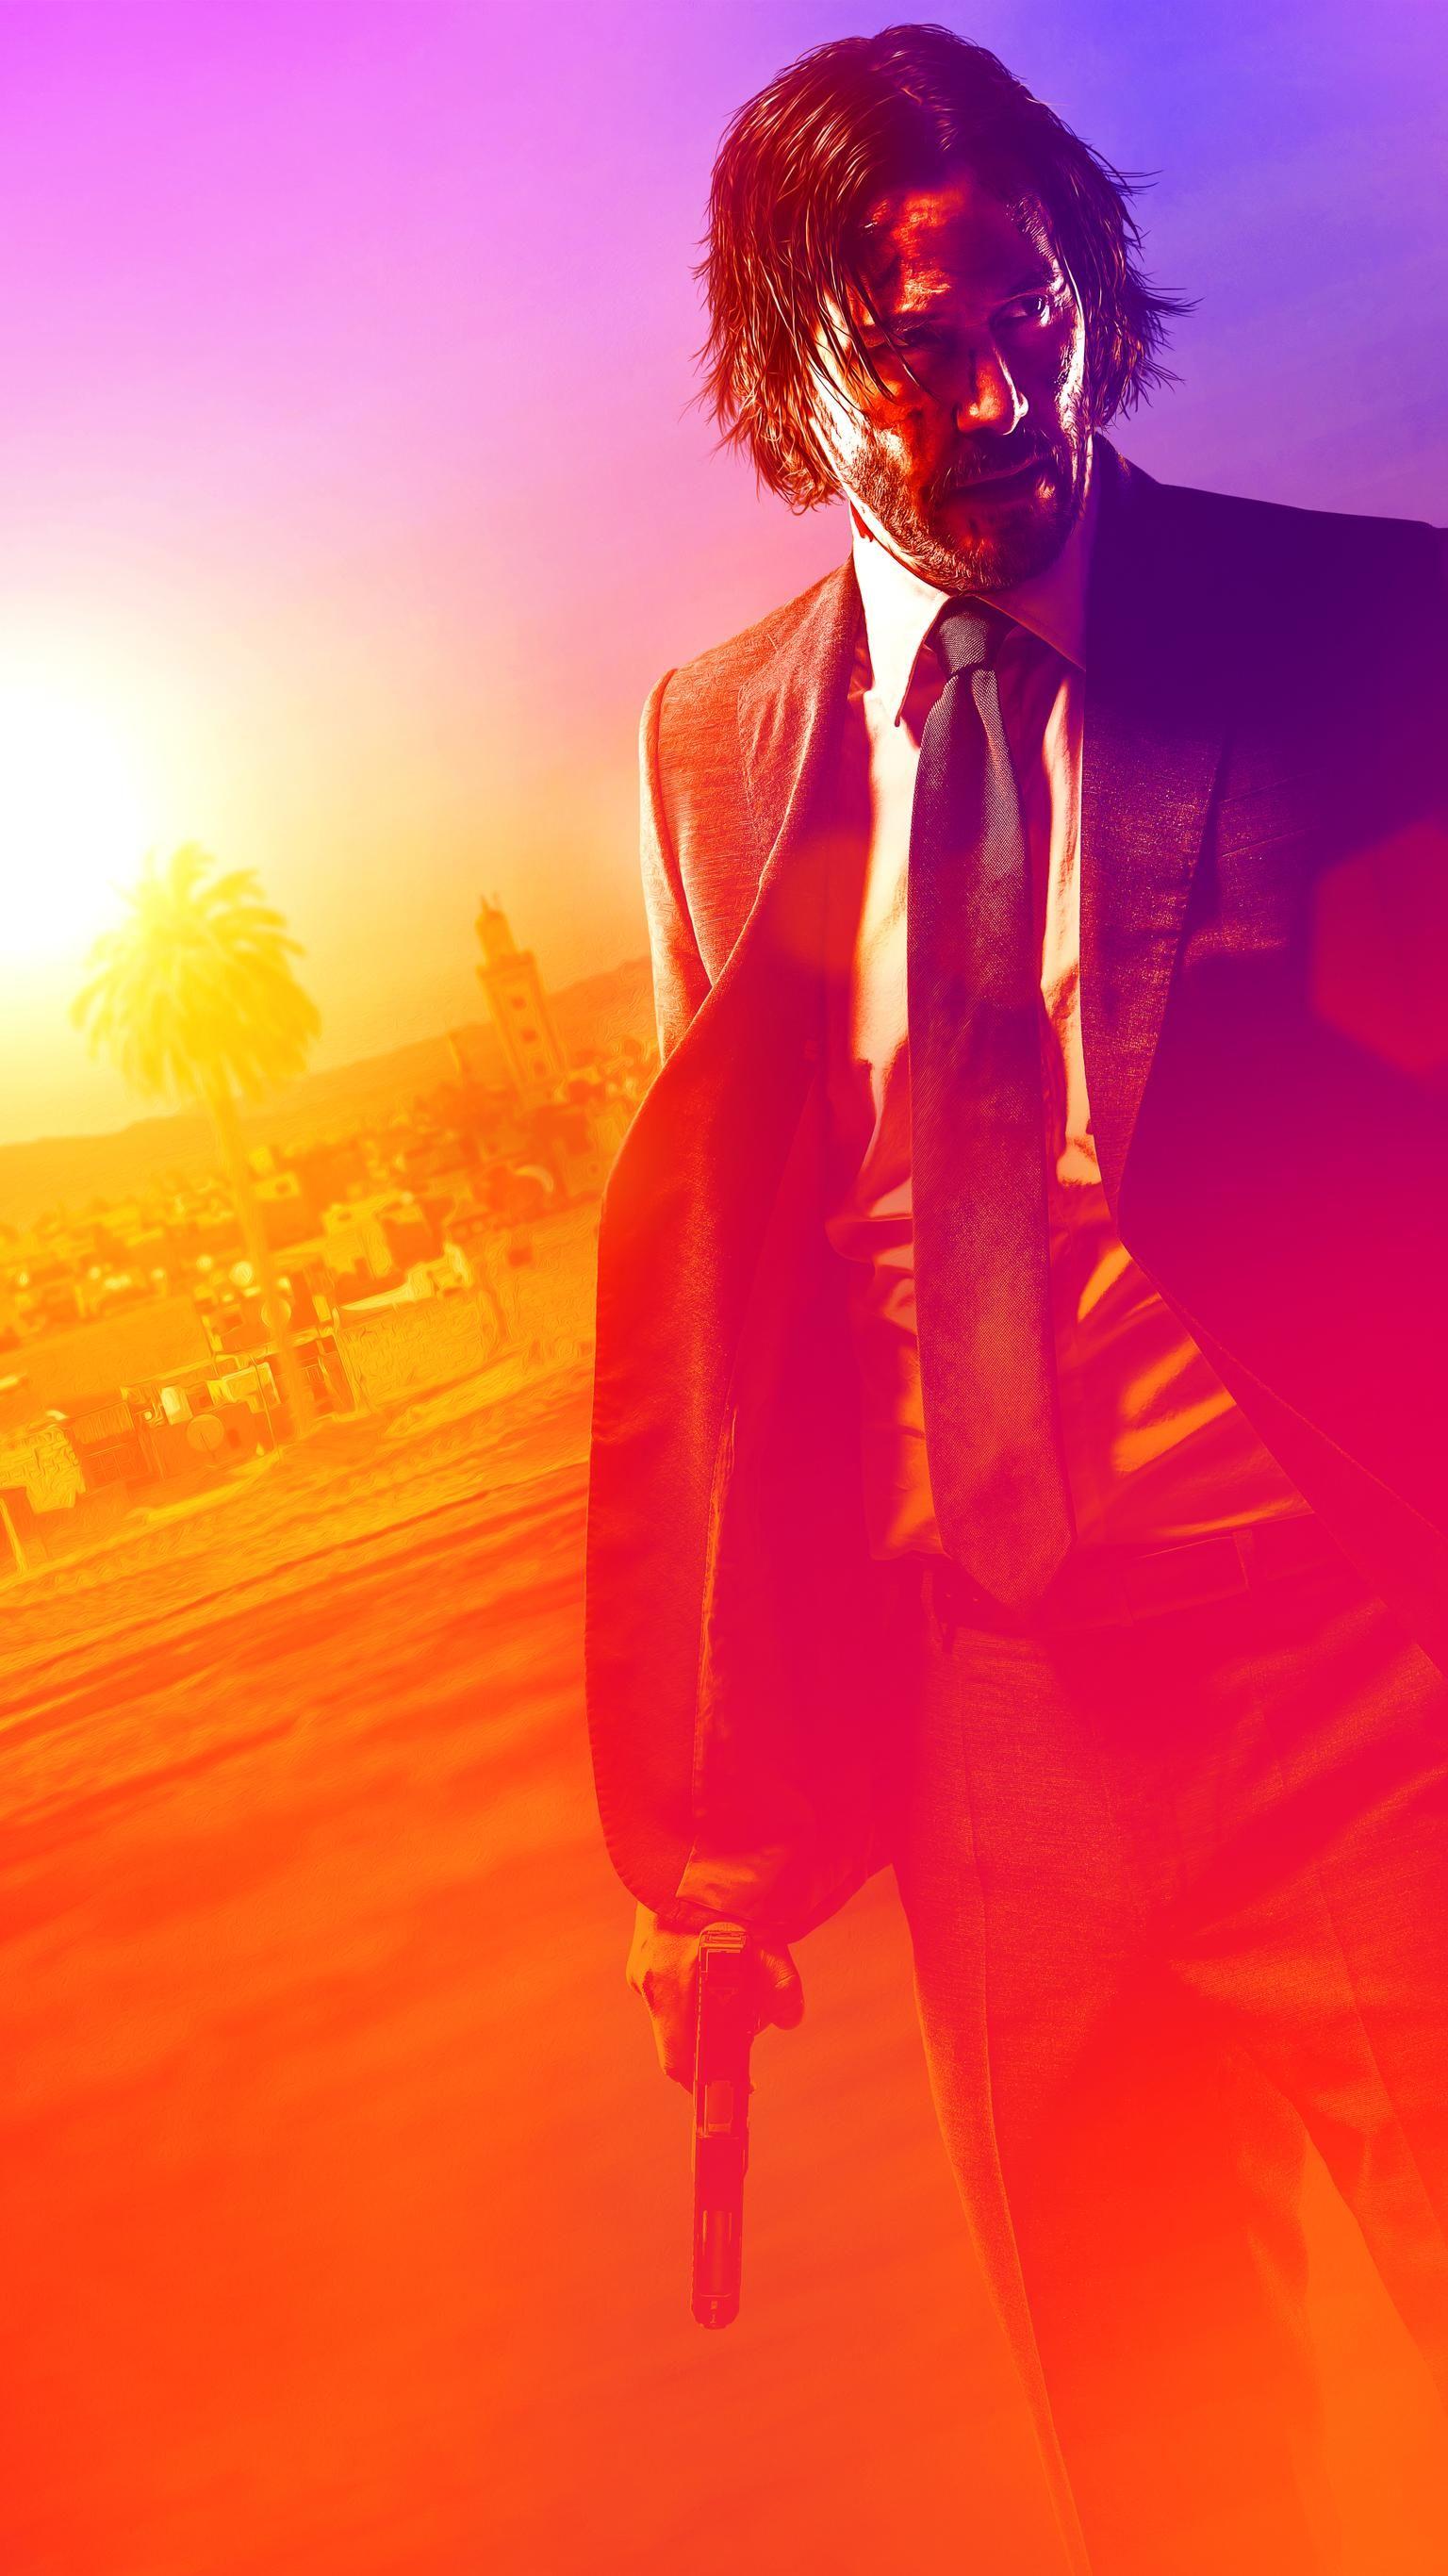 John Wick Chapter 3 Parabellum 2019 Phone Wallpaper Moviemania Marvel Movie Posters John Wick Hd John Wick Movie